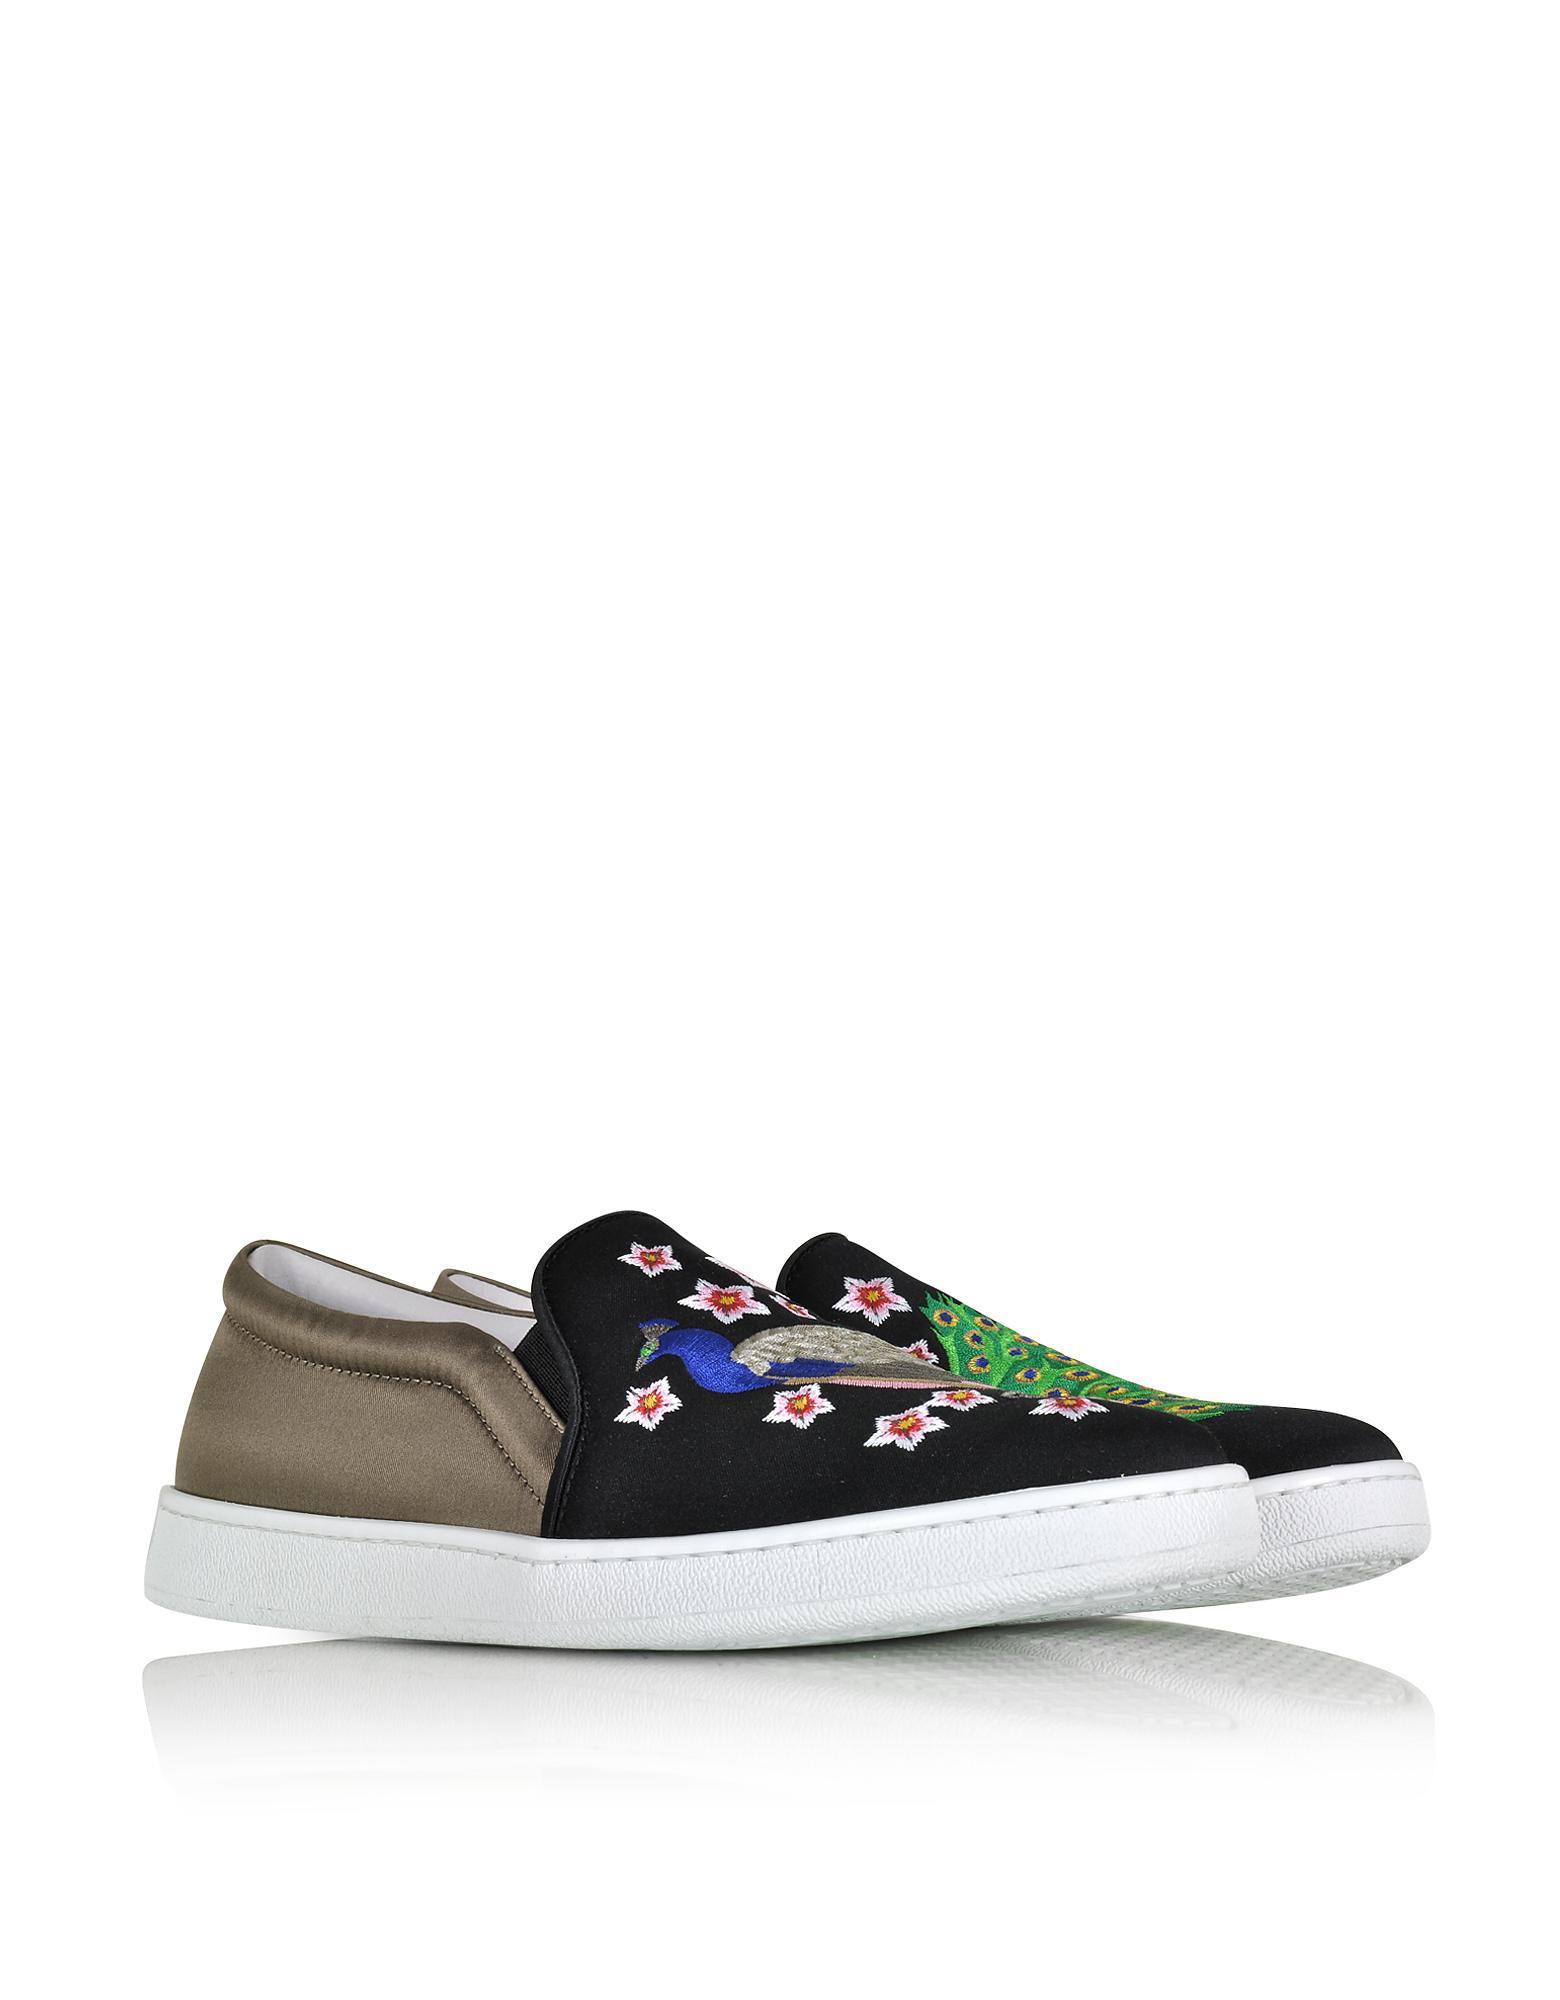 JOSHUA SANDERS Designer Shoes, Dragon Multicolor Fabric Slip-on Sneaker